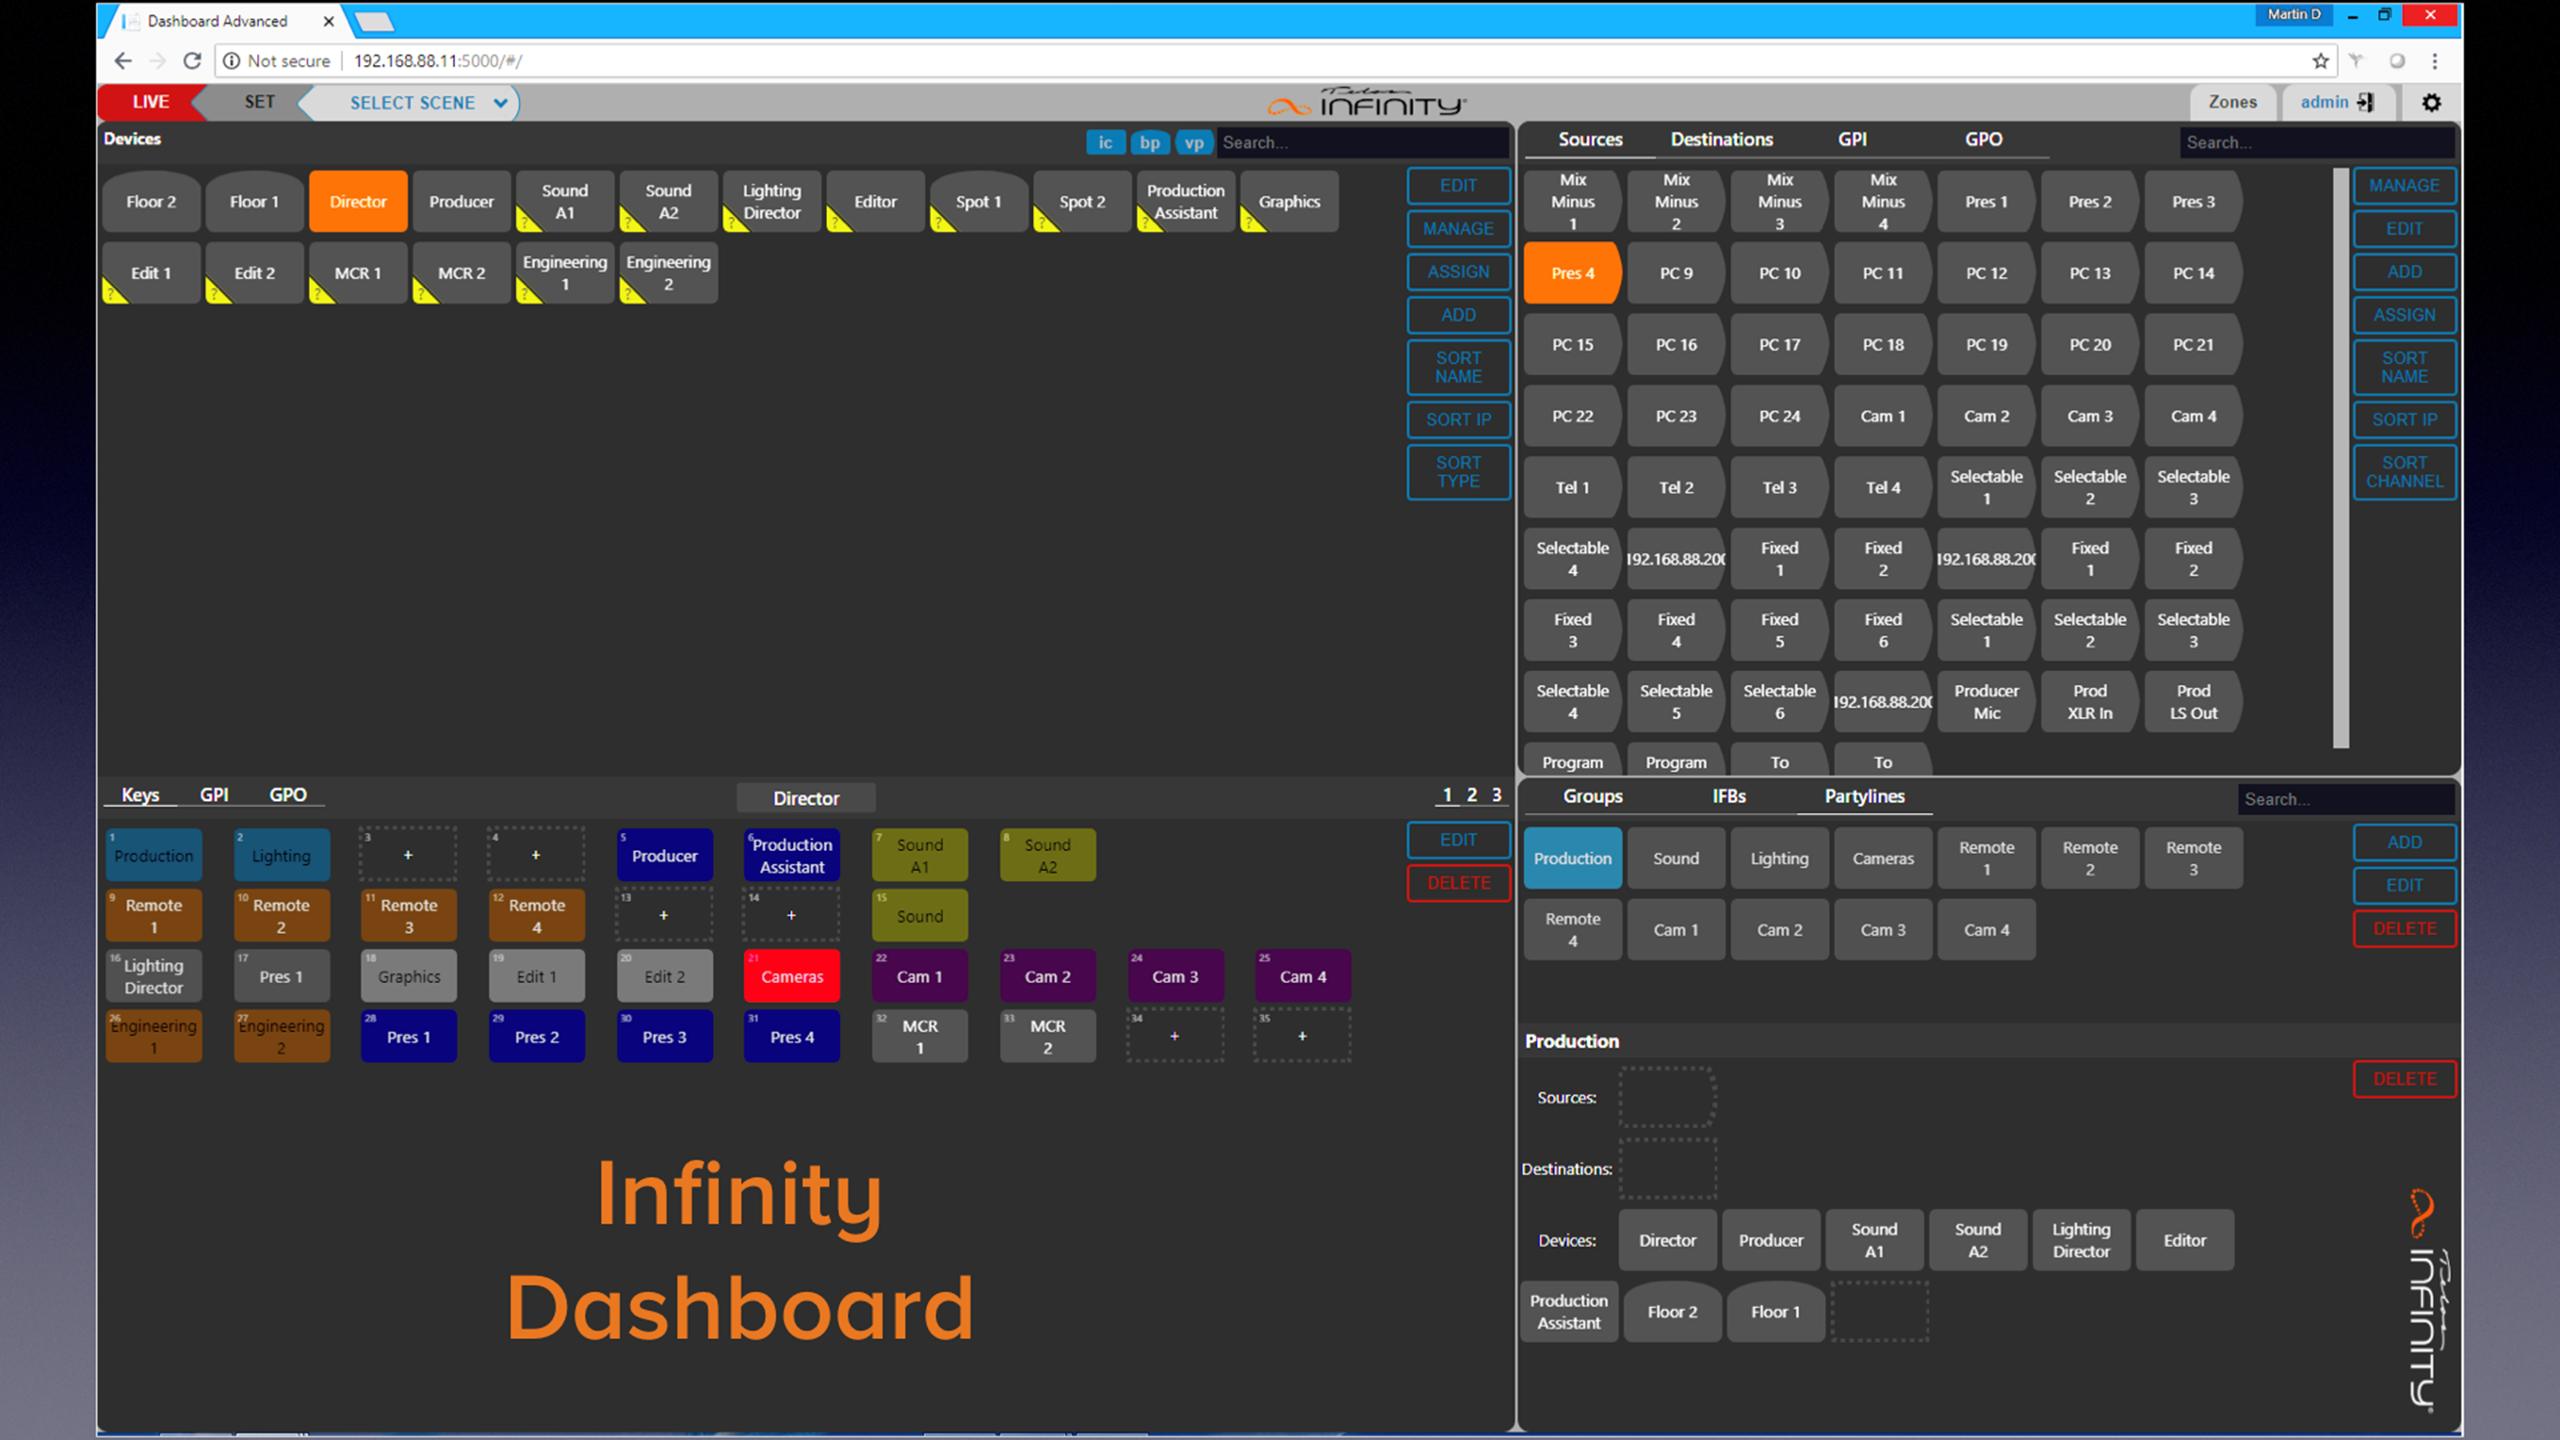 Infinity Dashboard screen